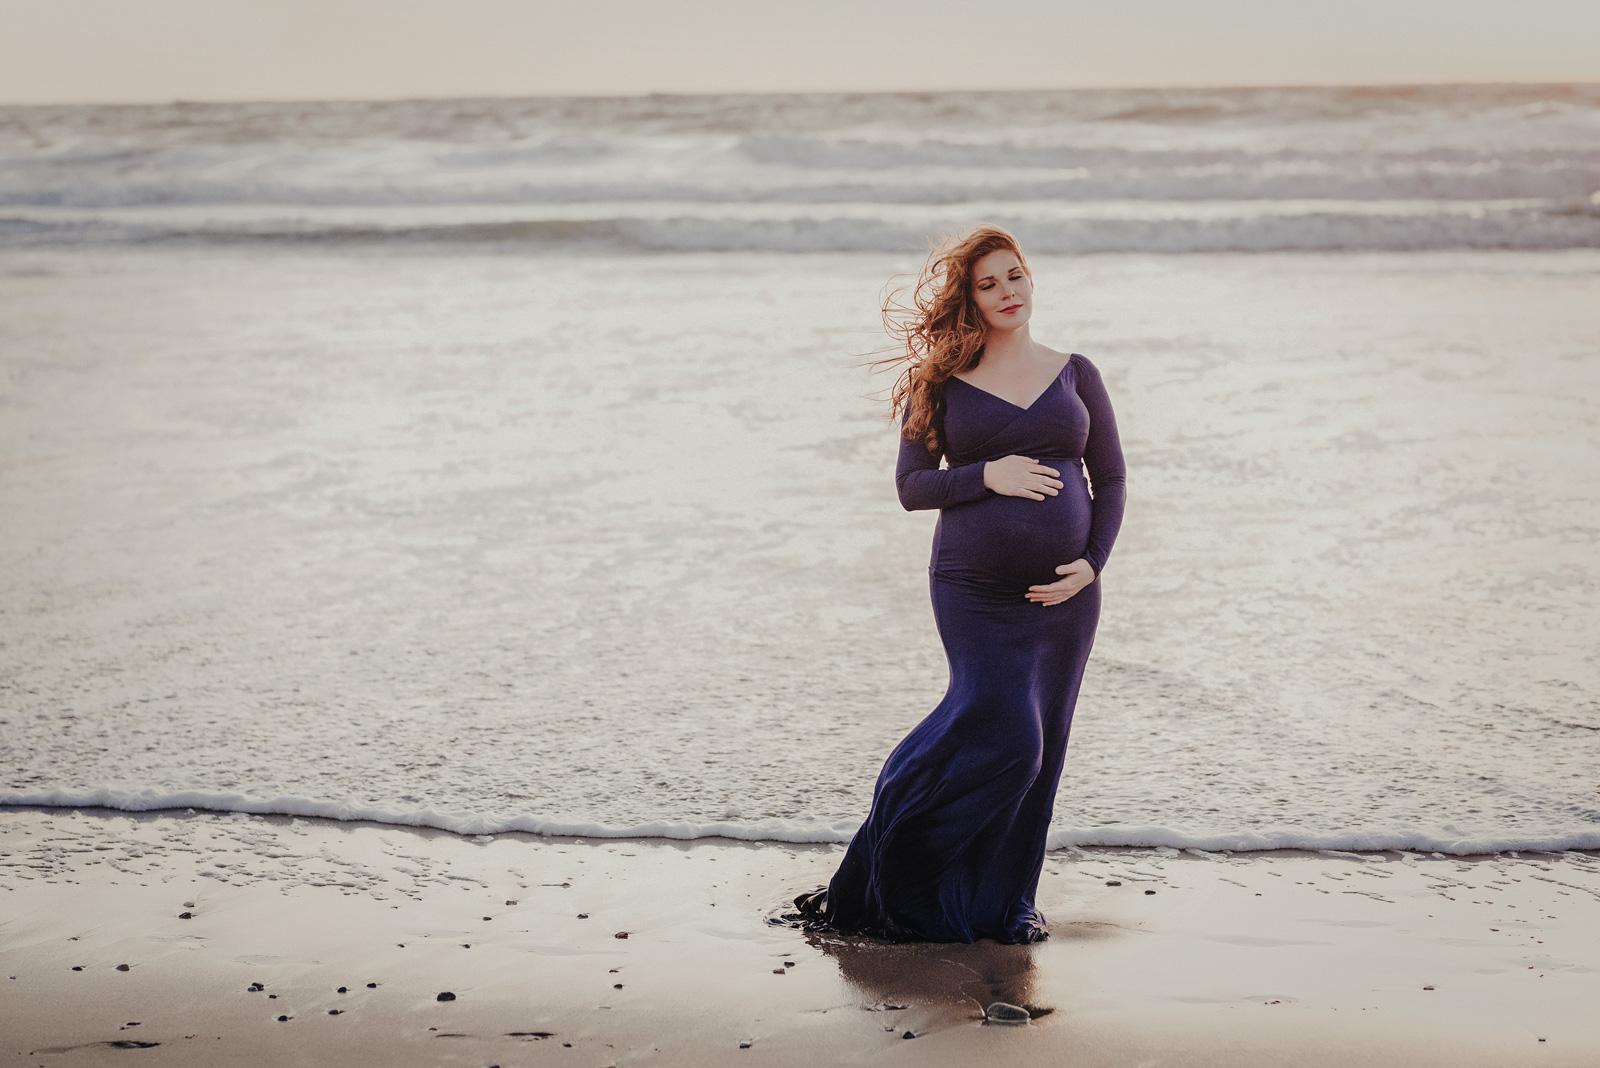 Dallas Maternity Photographer, Babymoon Photographer, Travel Photographer, Destination Photographer, Luxury Maternity Photographer, NYC Maternity Photographer, Beach Pregnancy Photo Shoot, Los Angeles Maternity Photographer